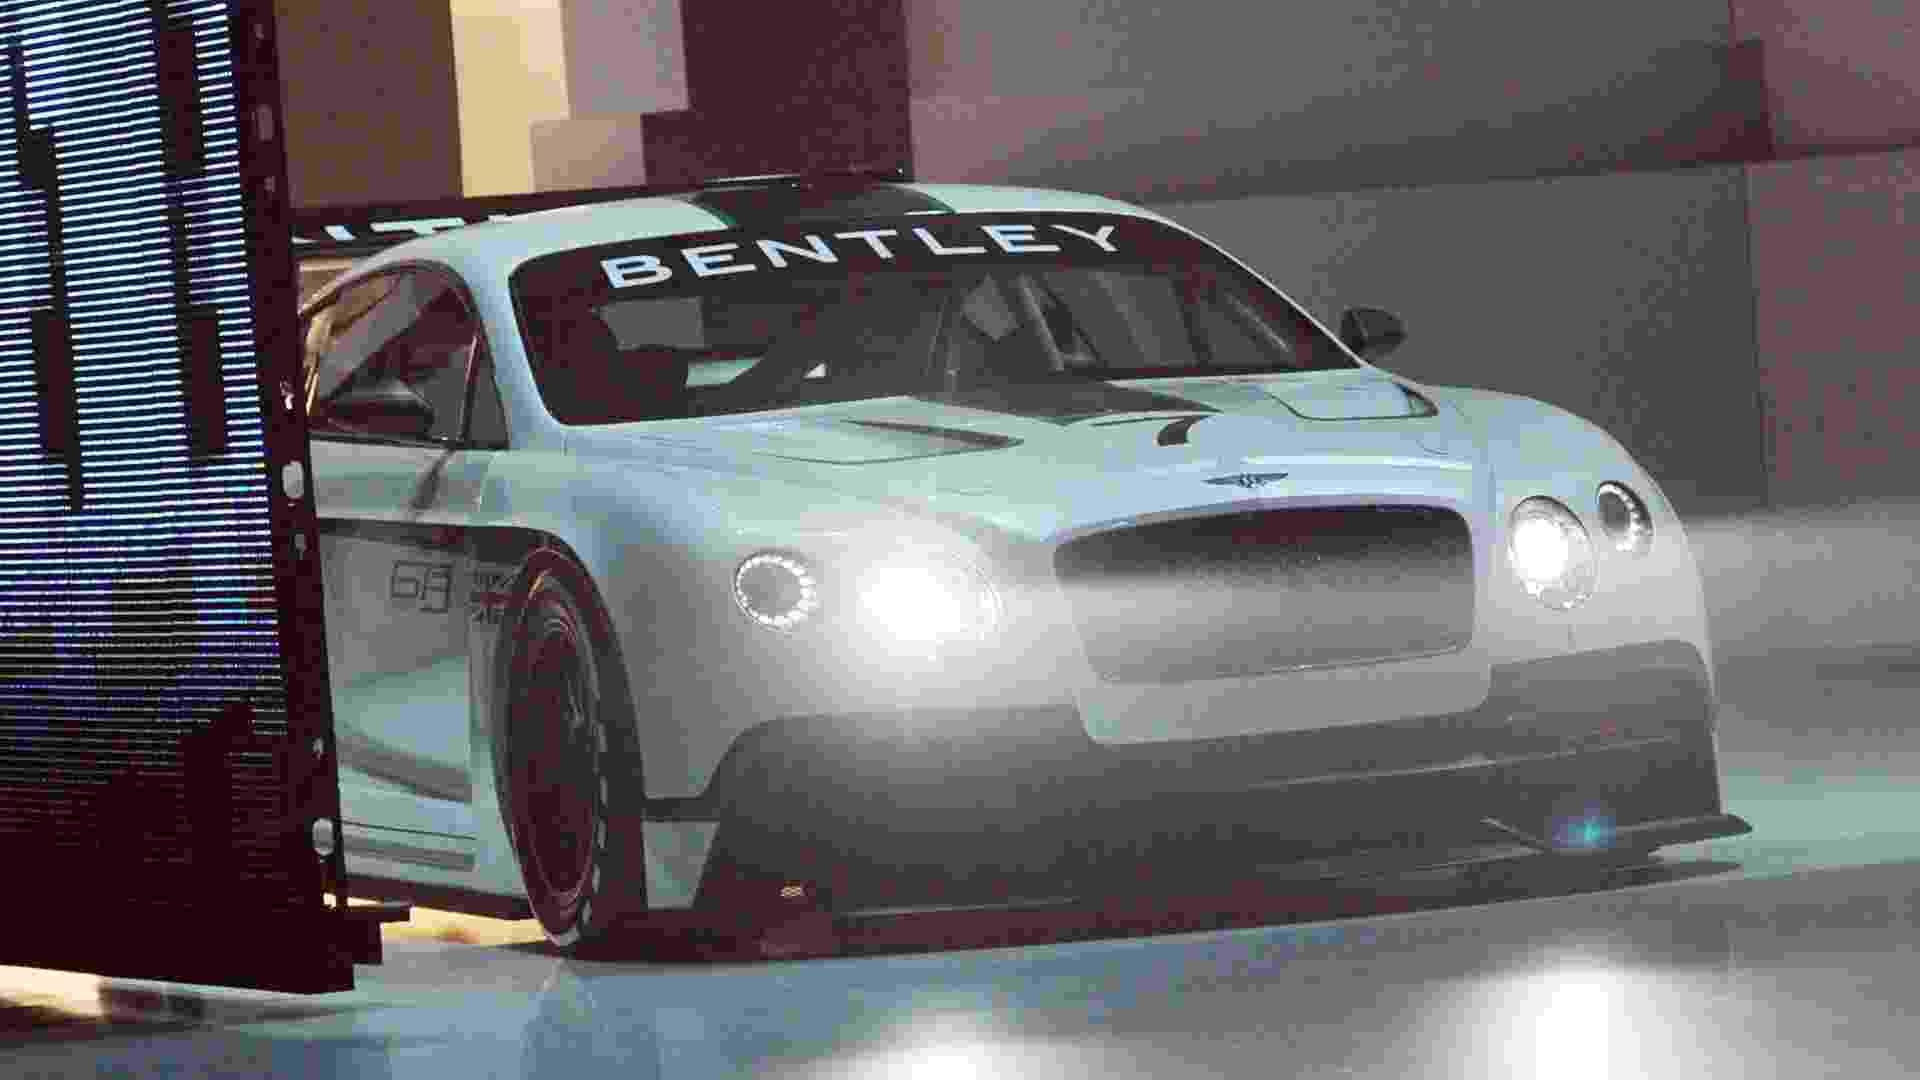 Bentley Continental GT3 - ULI DECK/EFE